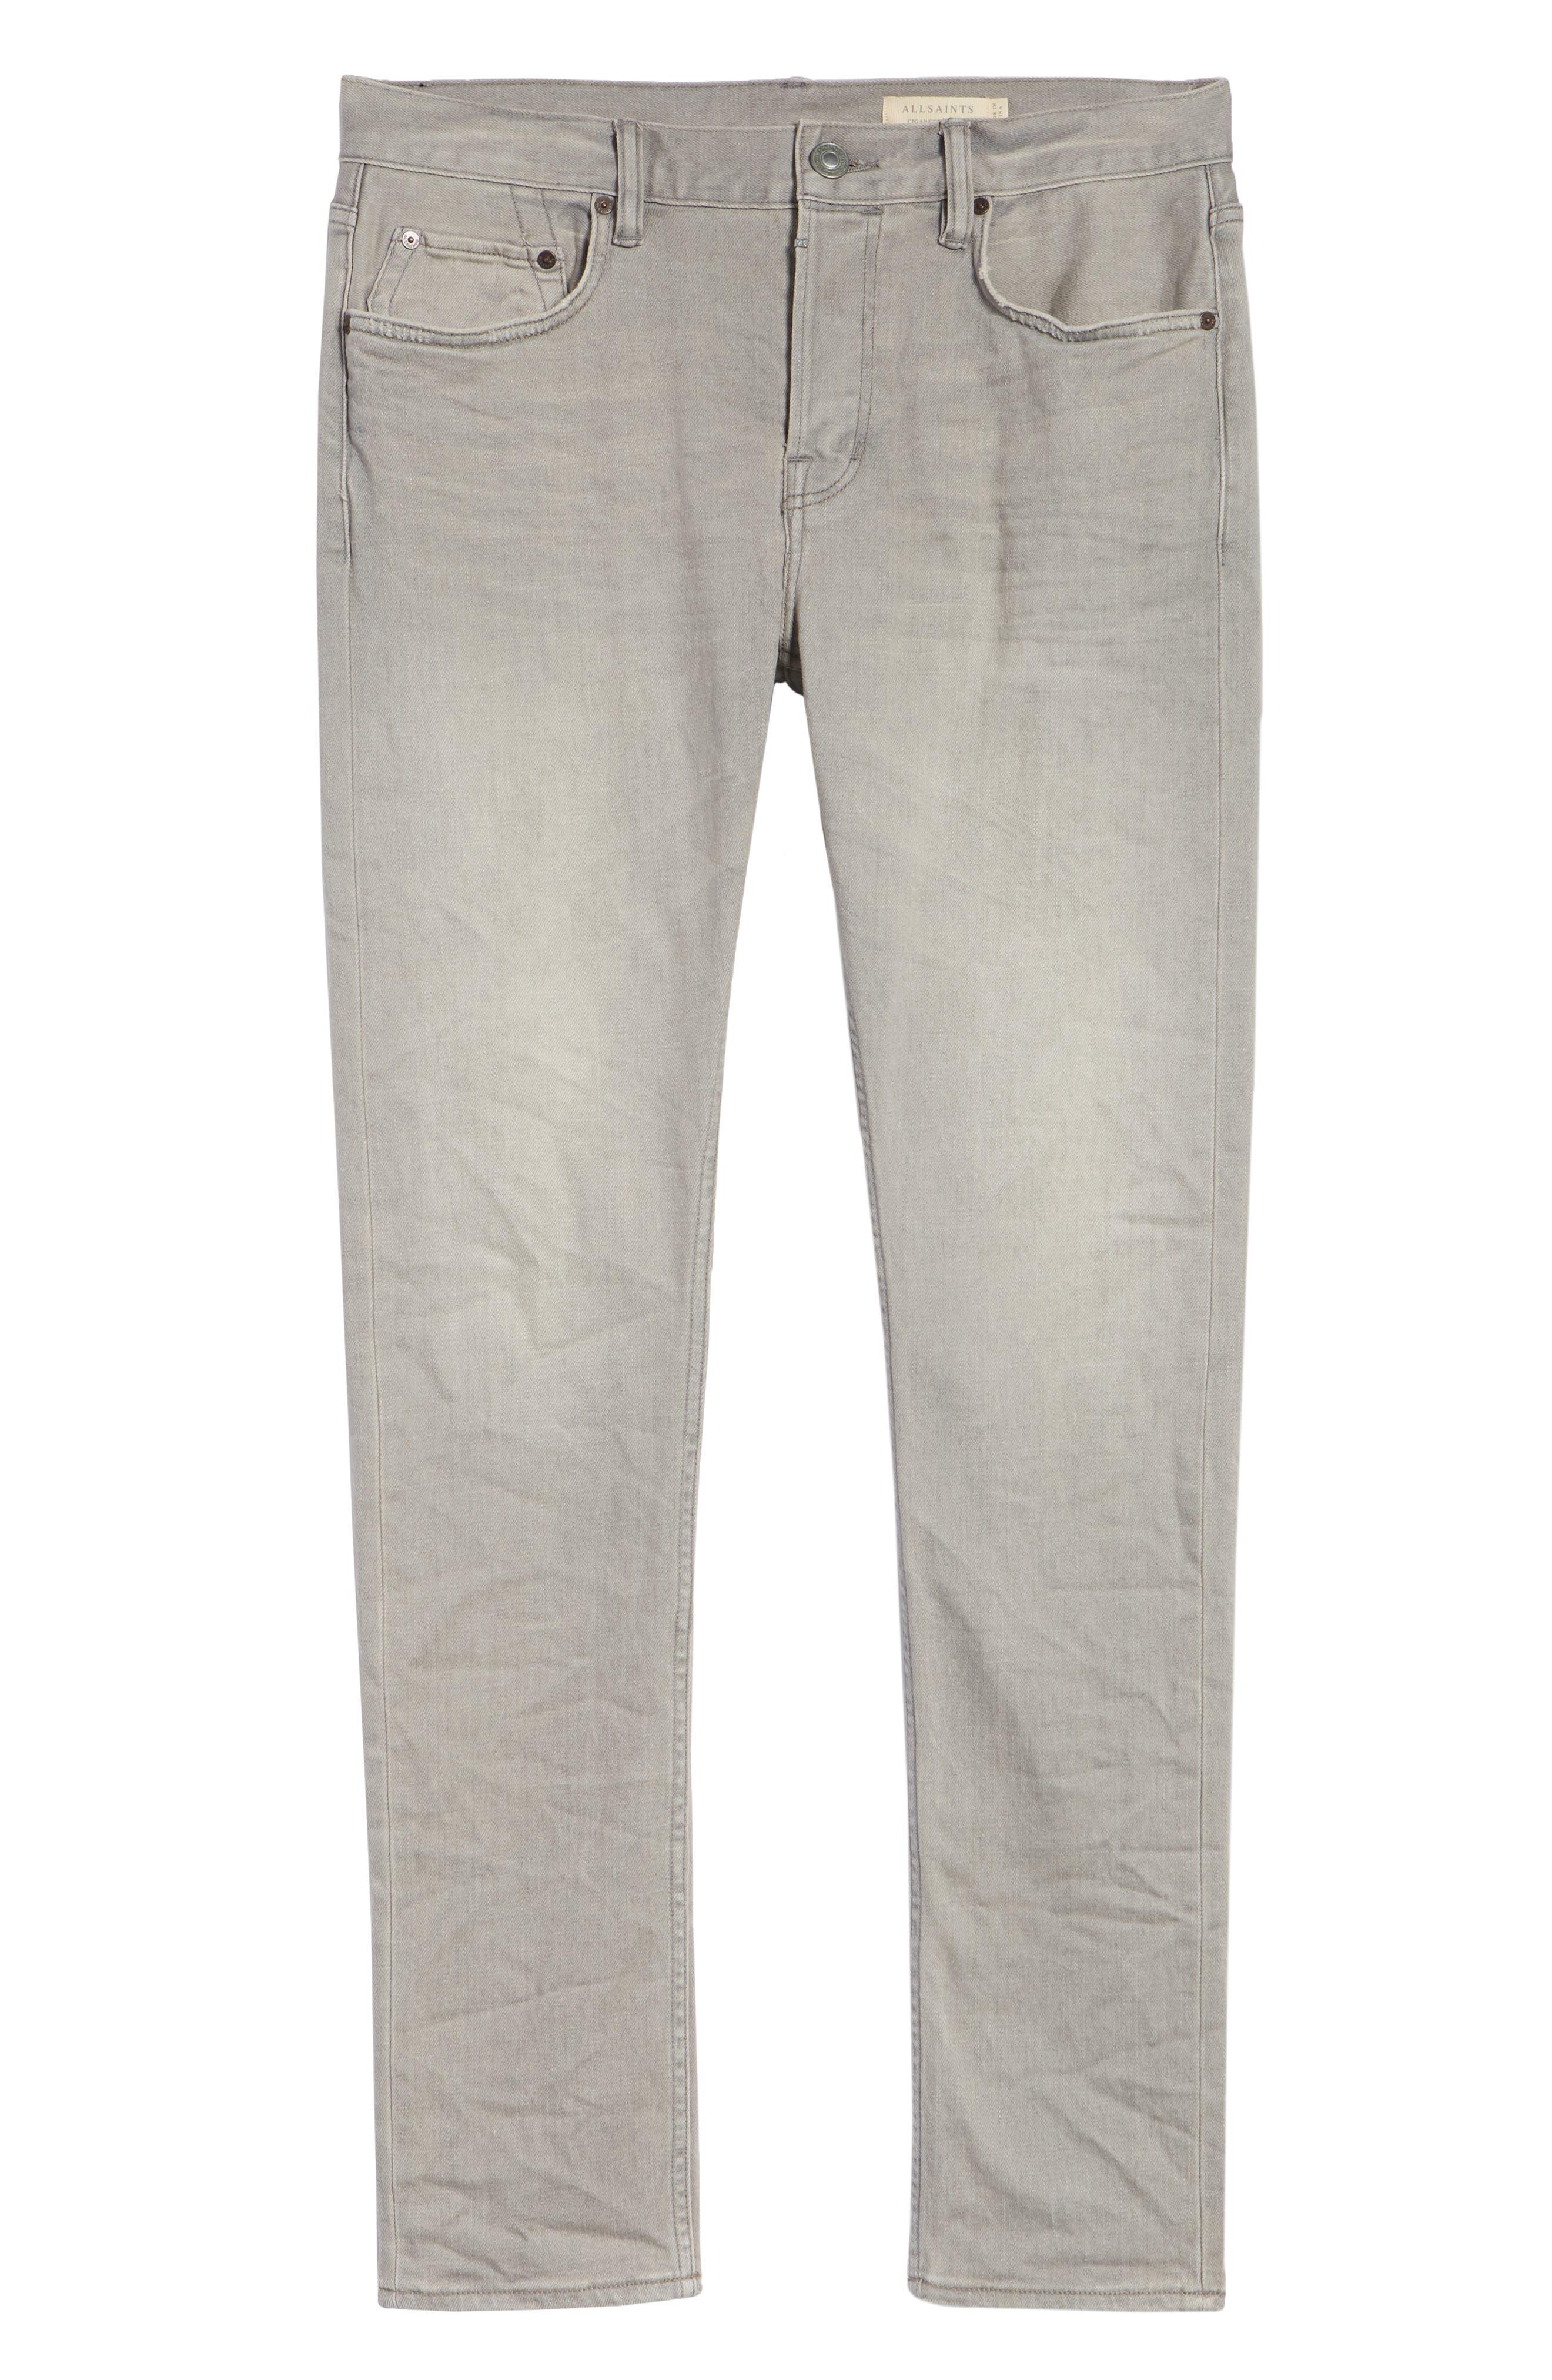 ALLSAINTS, Raveline Cigarette Skinny Fit Jeans, Alternate thumbnail 7, color, GREY